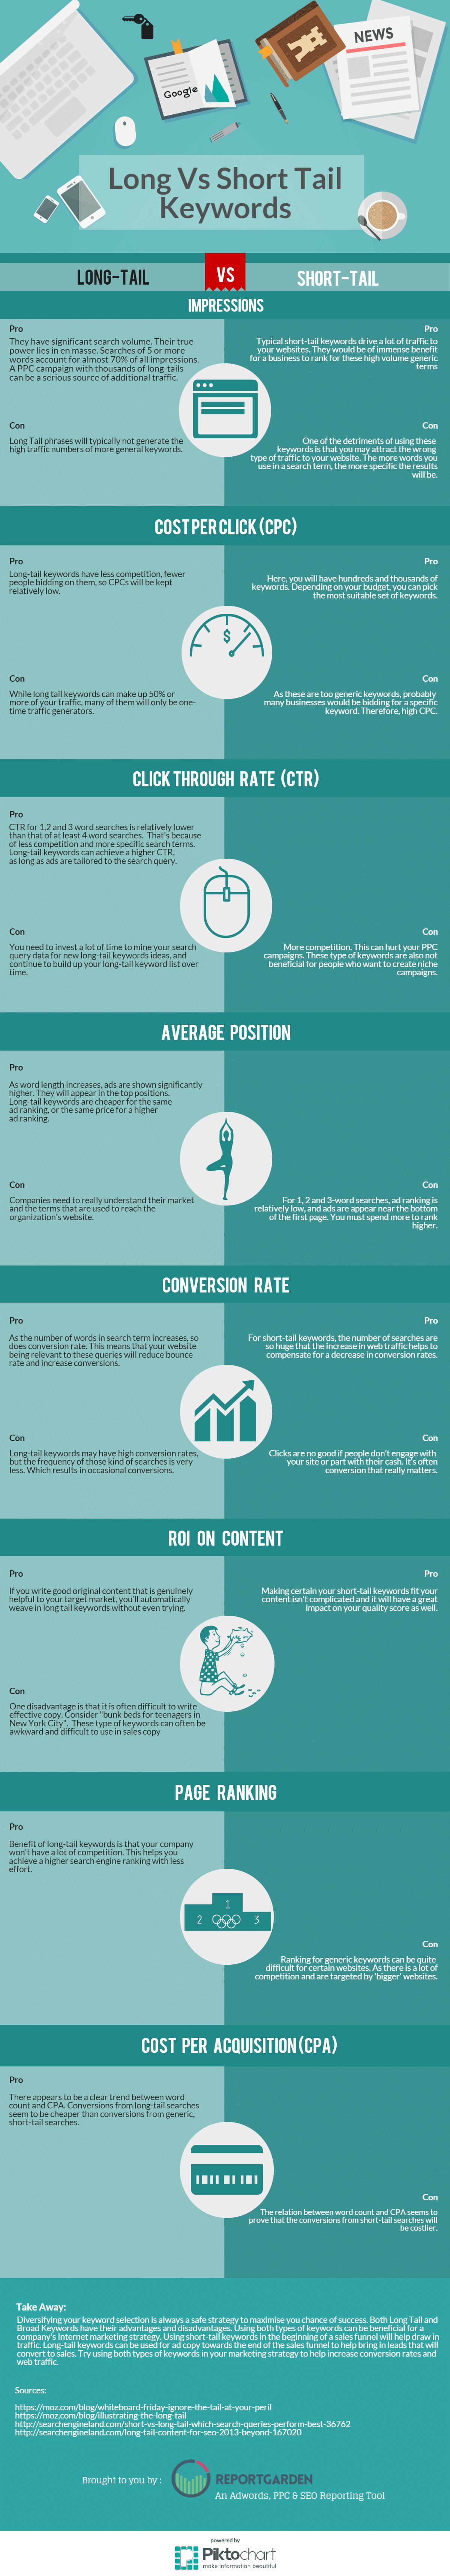 long-tail-vs-short-tail-keyword-compressor